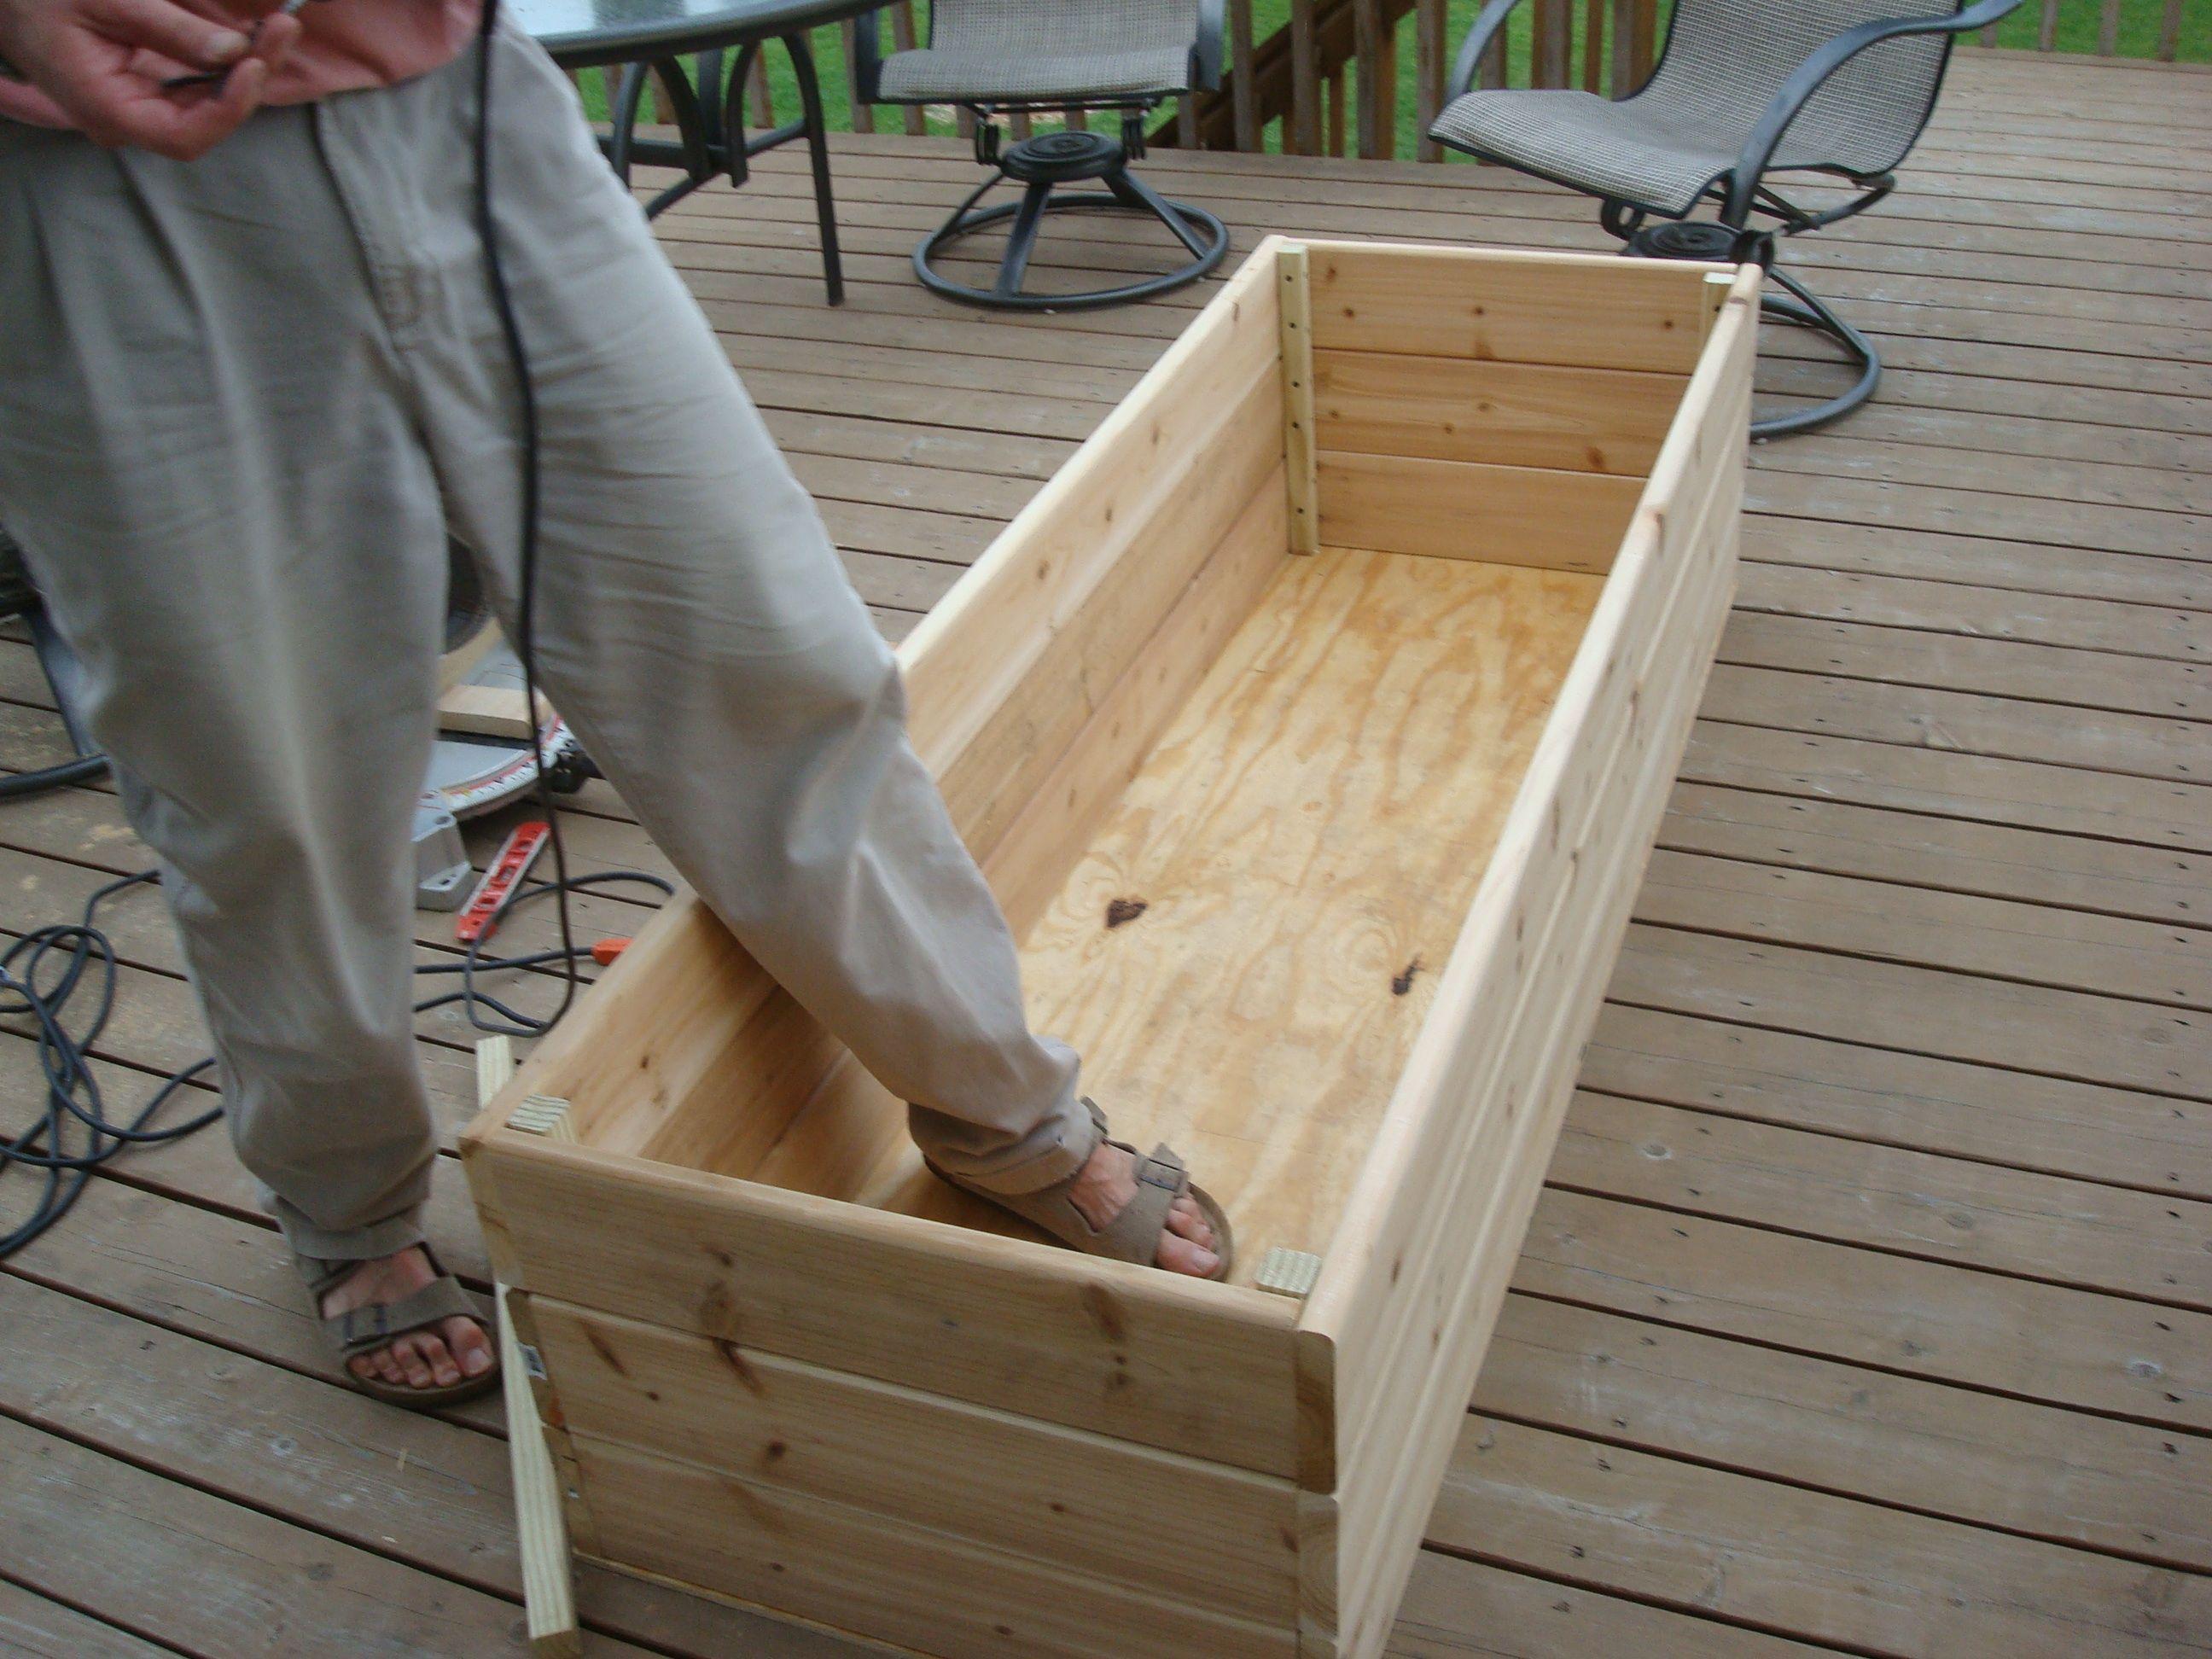 Diy Deck Planter Box Plans Wooden Pdf Adirondack Chair 400 x 300